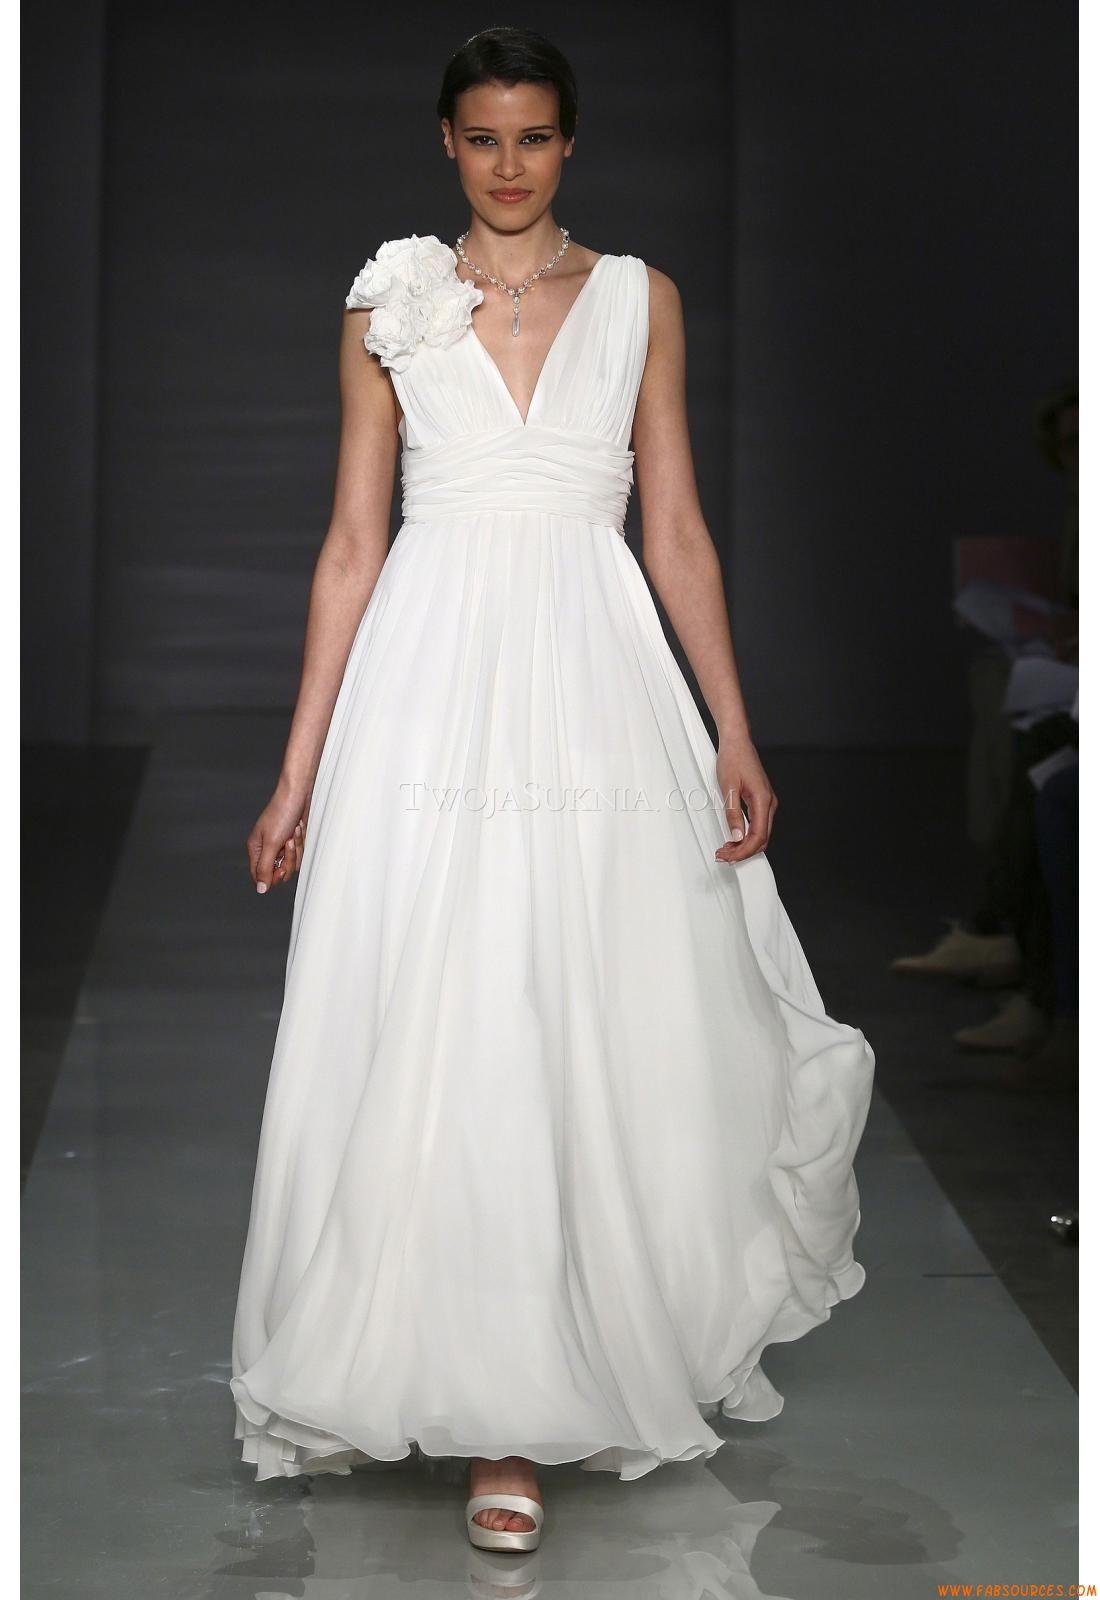 Robes De Mariee Cymbeline Helsinki Les Vintages 2014 Wedding Dresses Inexpensive Wedding Dresses Short Wedding Dress [ 1600 x 1100 Pixel ]